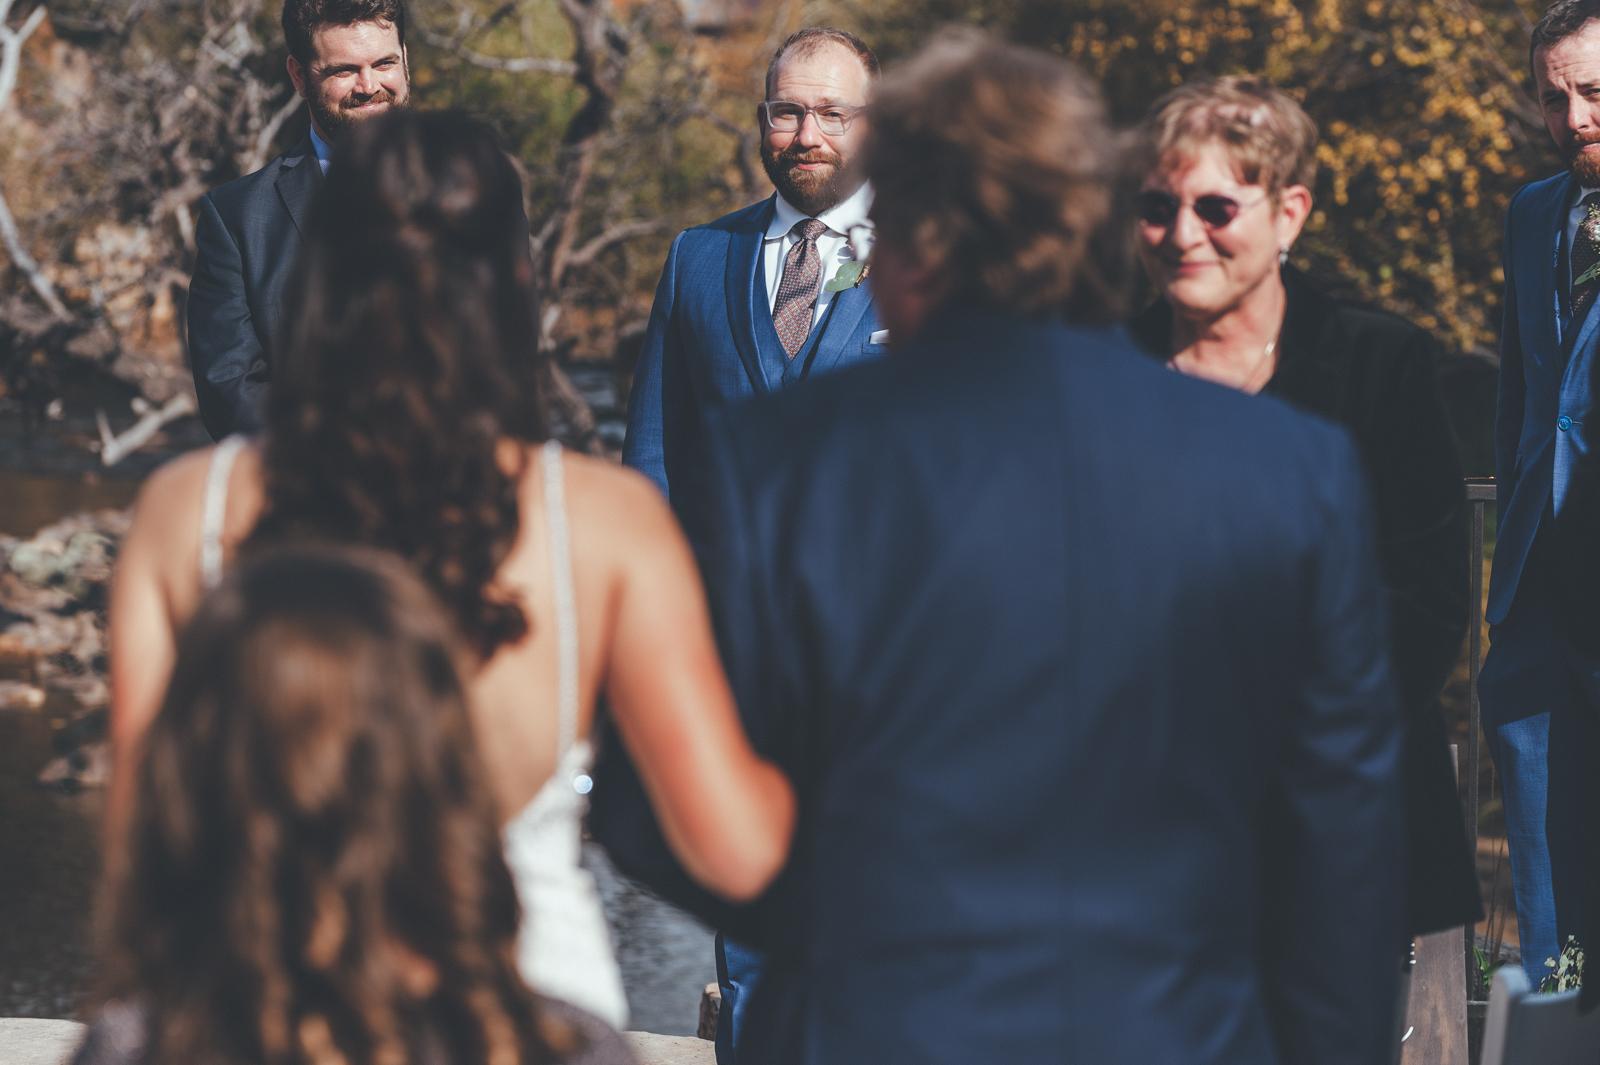 ChadFahnestockPhotography-estes-park-wedding-photography-017.jpg